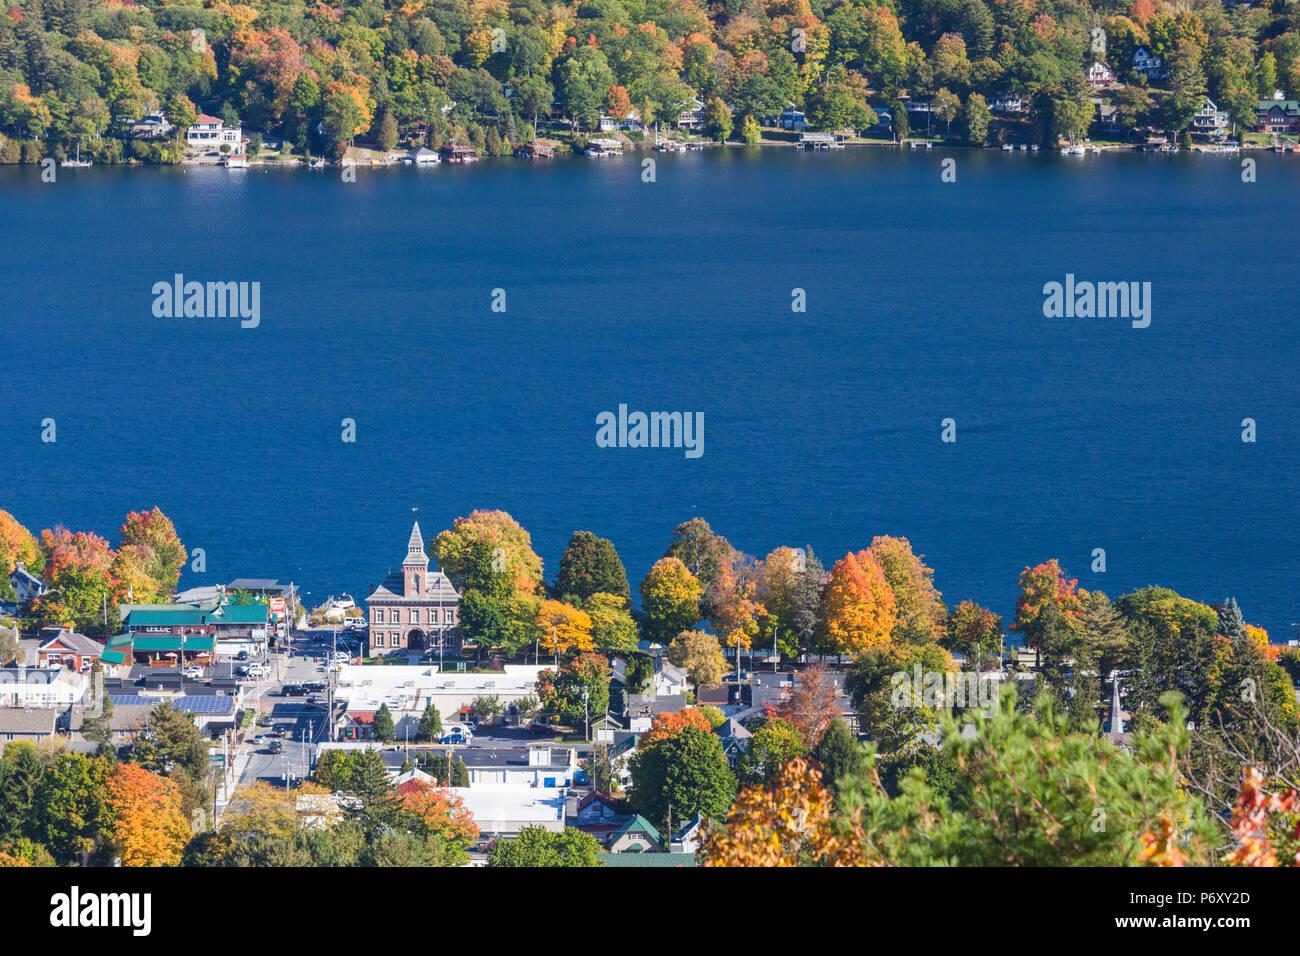 USA, New York, Adirondack Mountains, Lake George, Erhöhte Ansicht, Herbst Stockbild